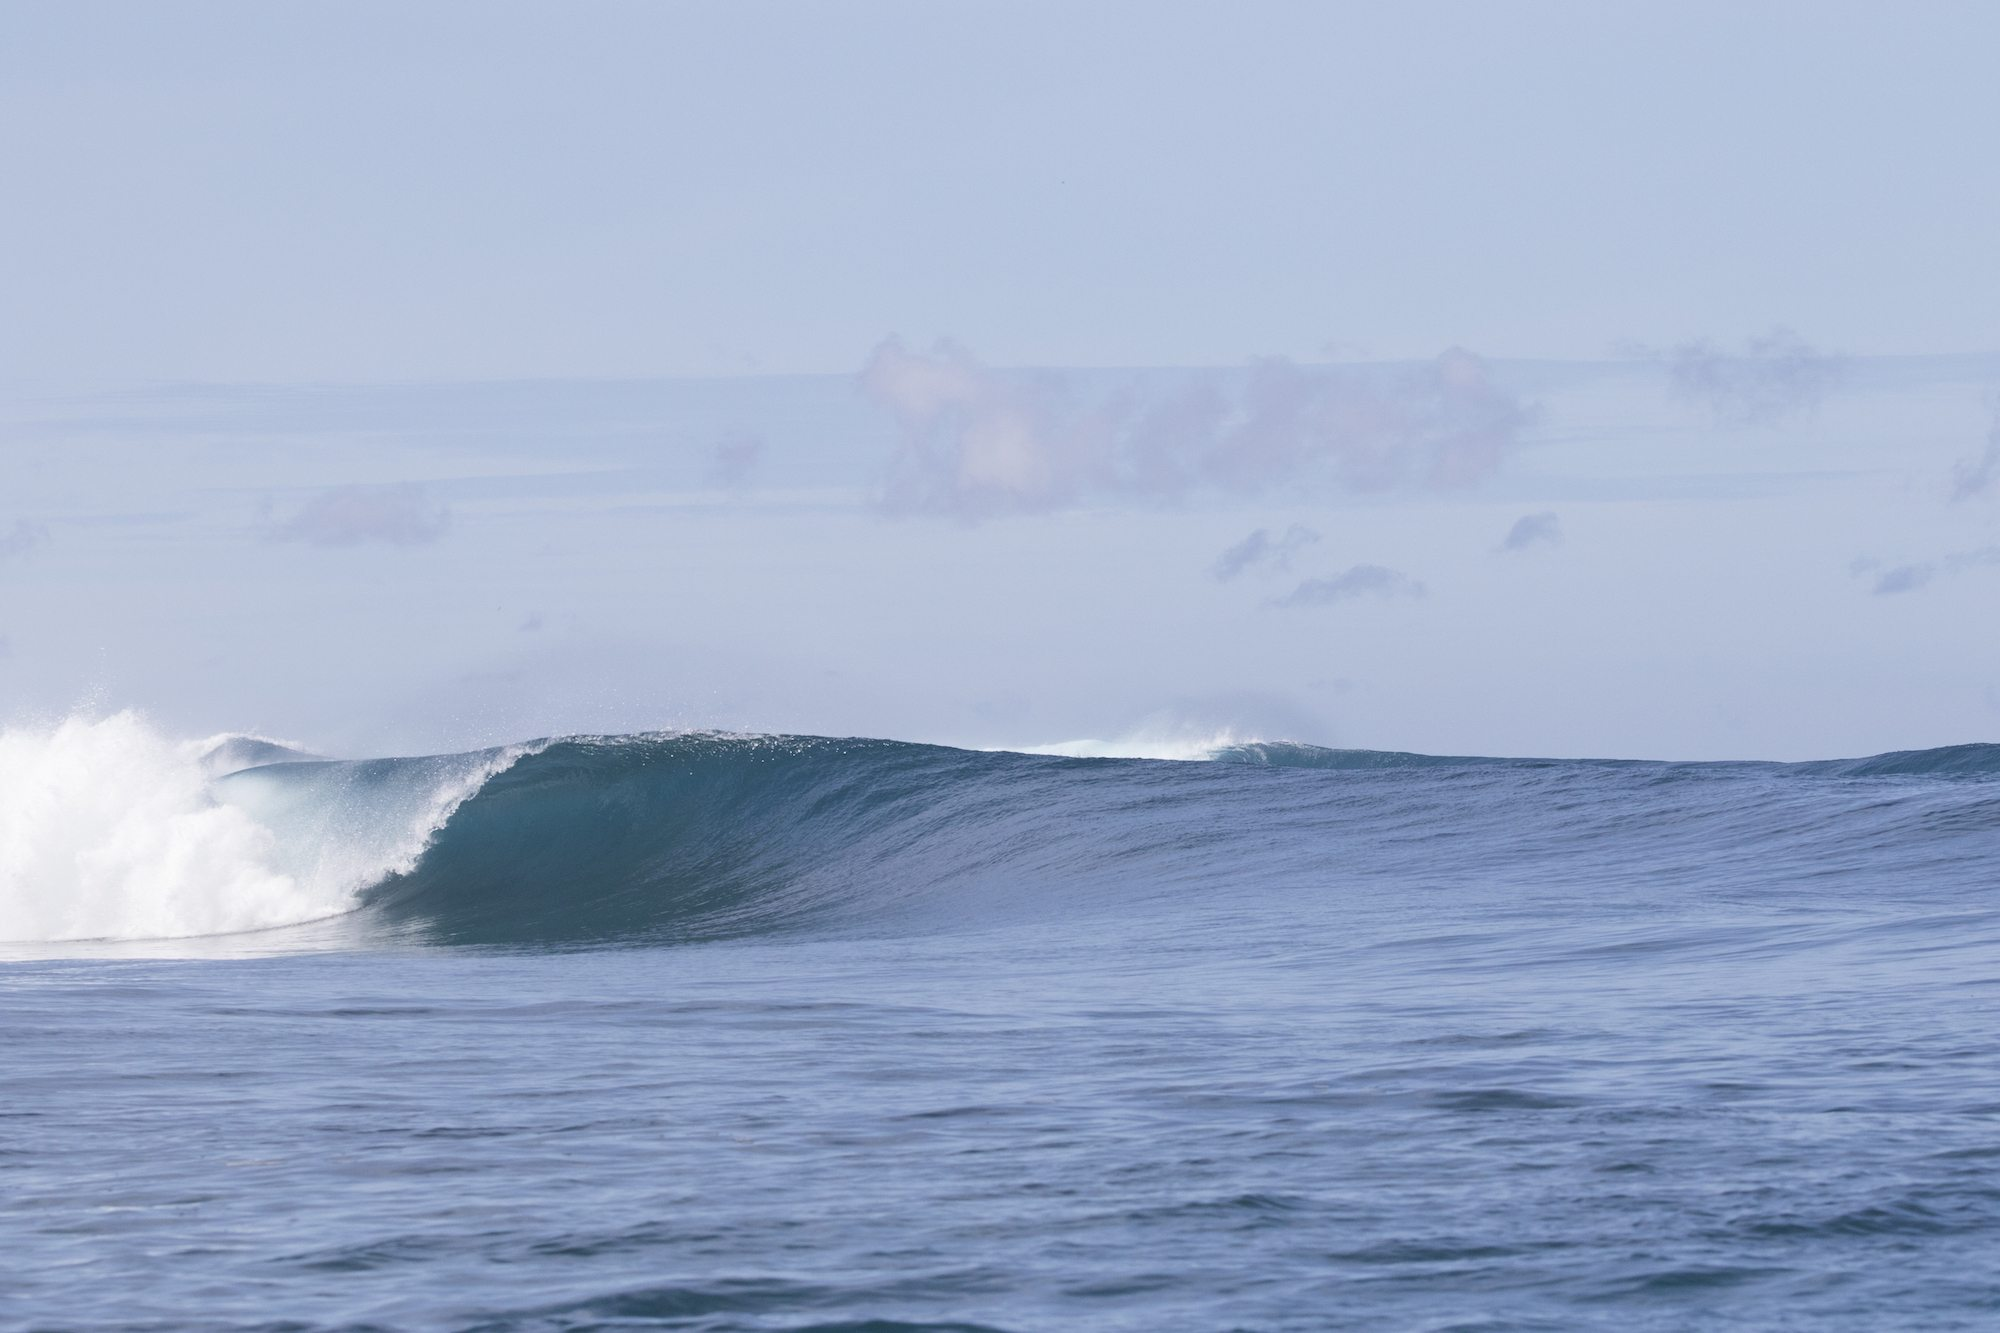 Clarets / Lolok Point / Bay of Plenty Lefts 5